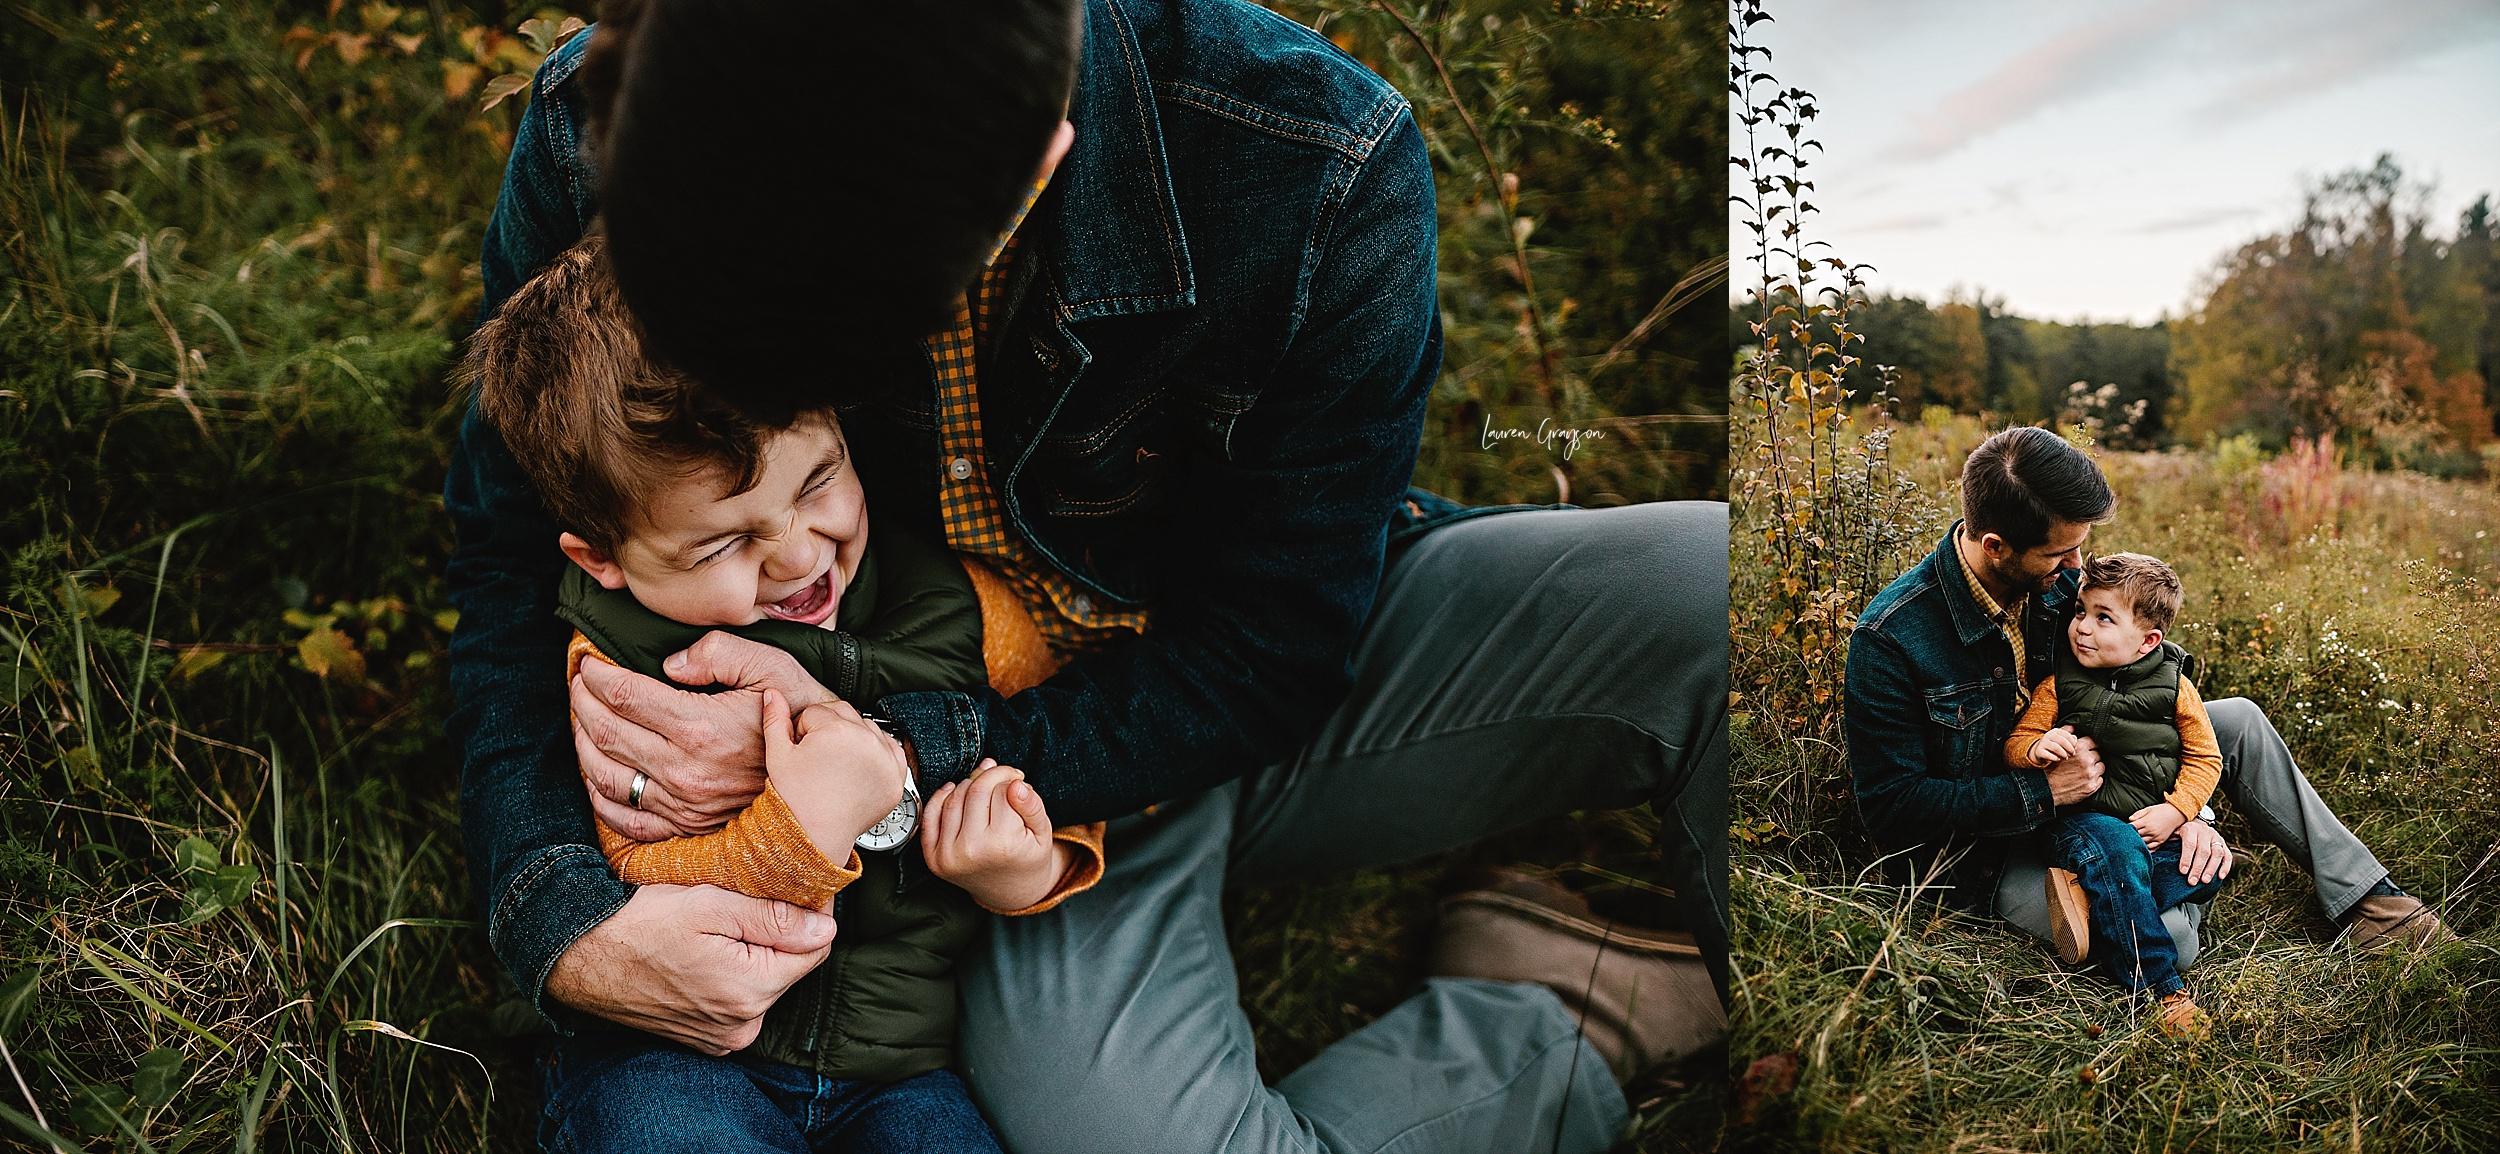 lauren-grayson-photography-akron-photographer-family-carro_1004.jpg